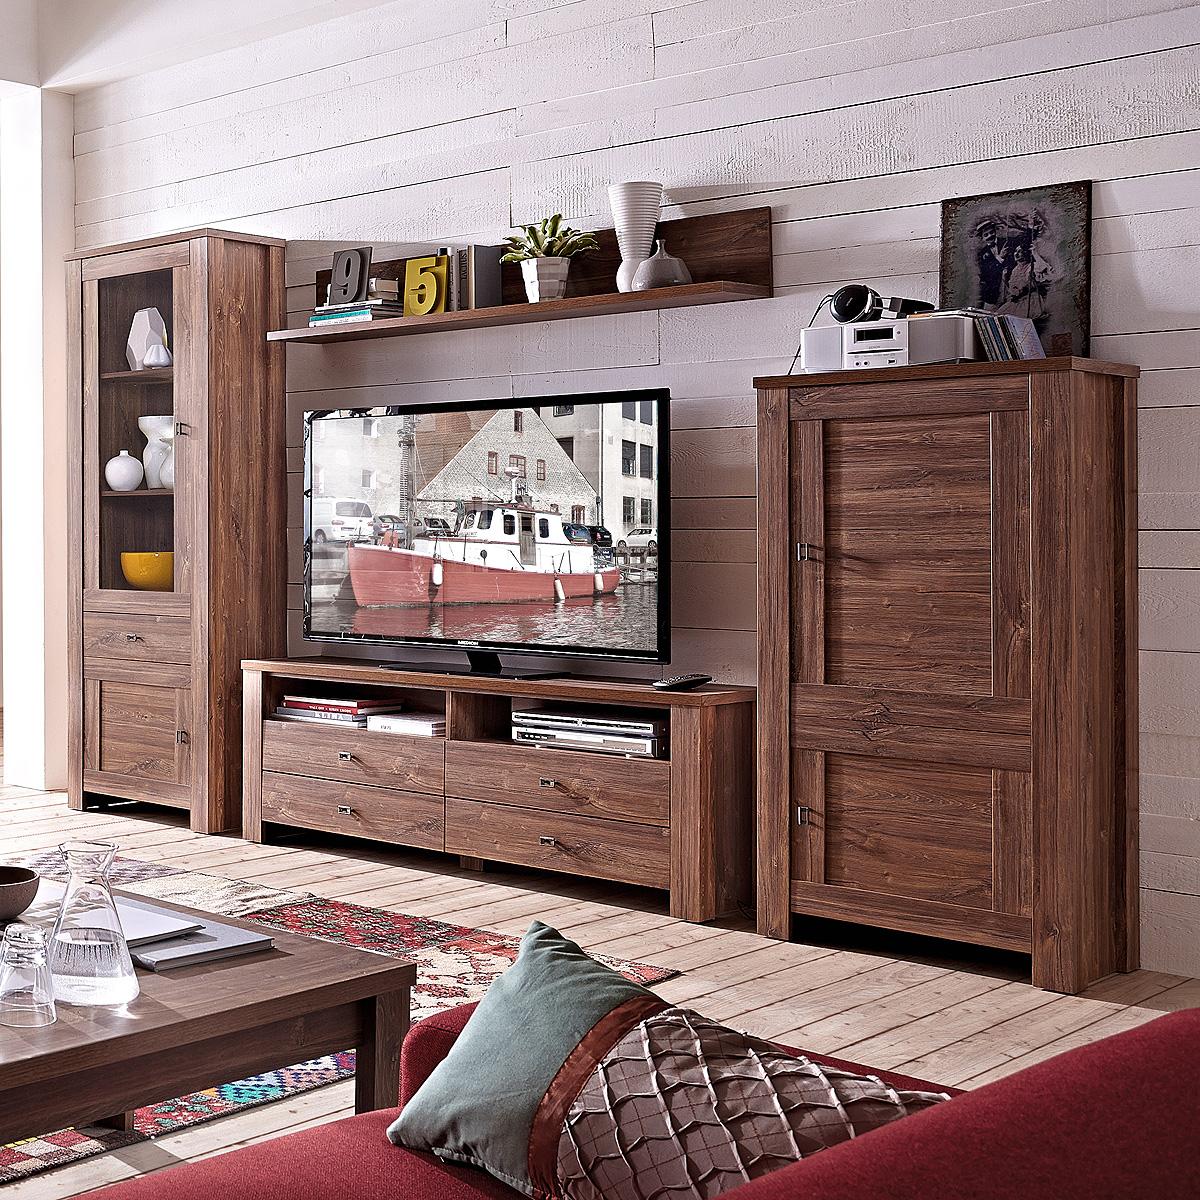 wohnwand 1 br ssel anbauwand wohnkombi wohnzimmer in akazie dunkel inkl led 4059236034903 ebay. Black Bedroom Furniture Sets. Home Design Ideas